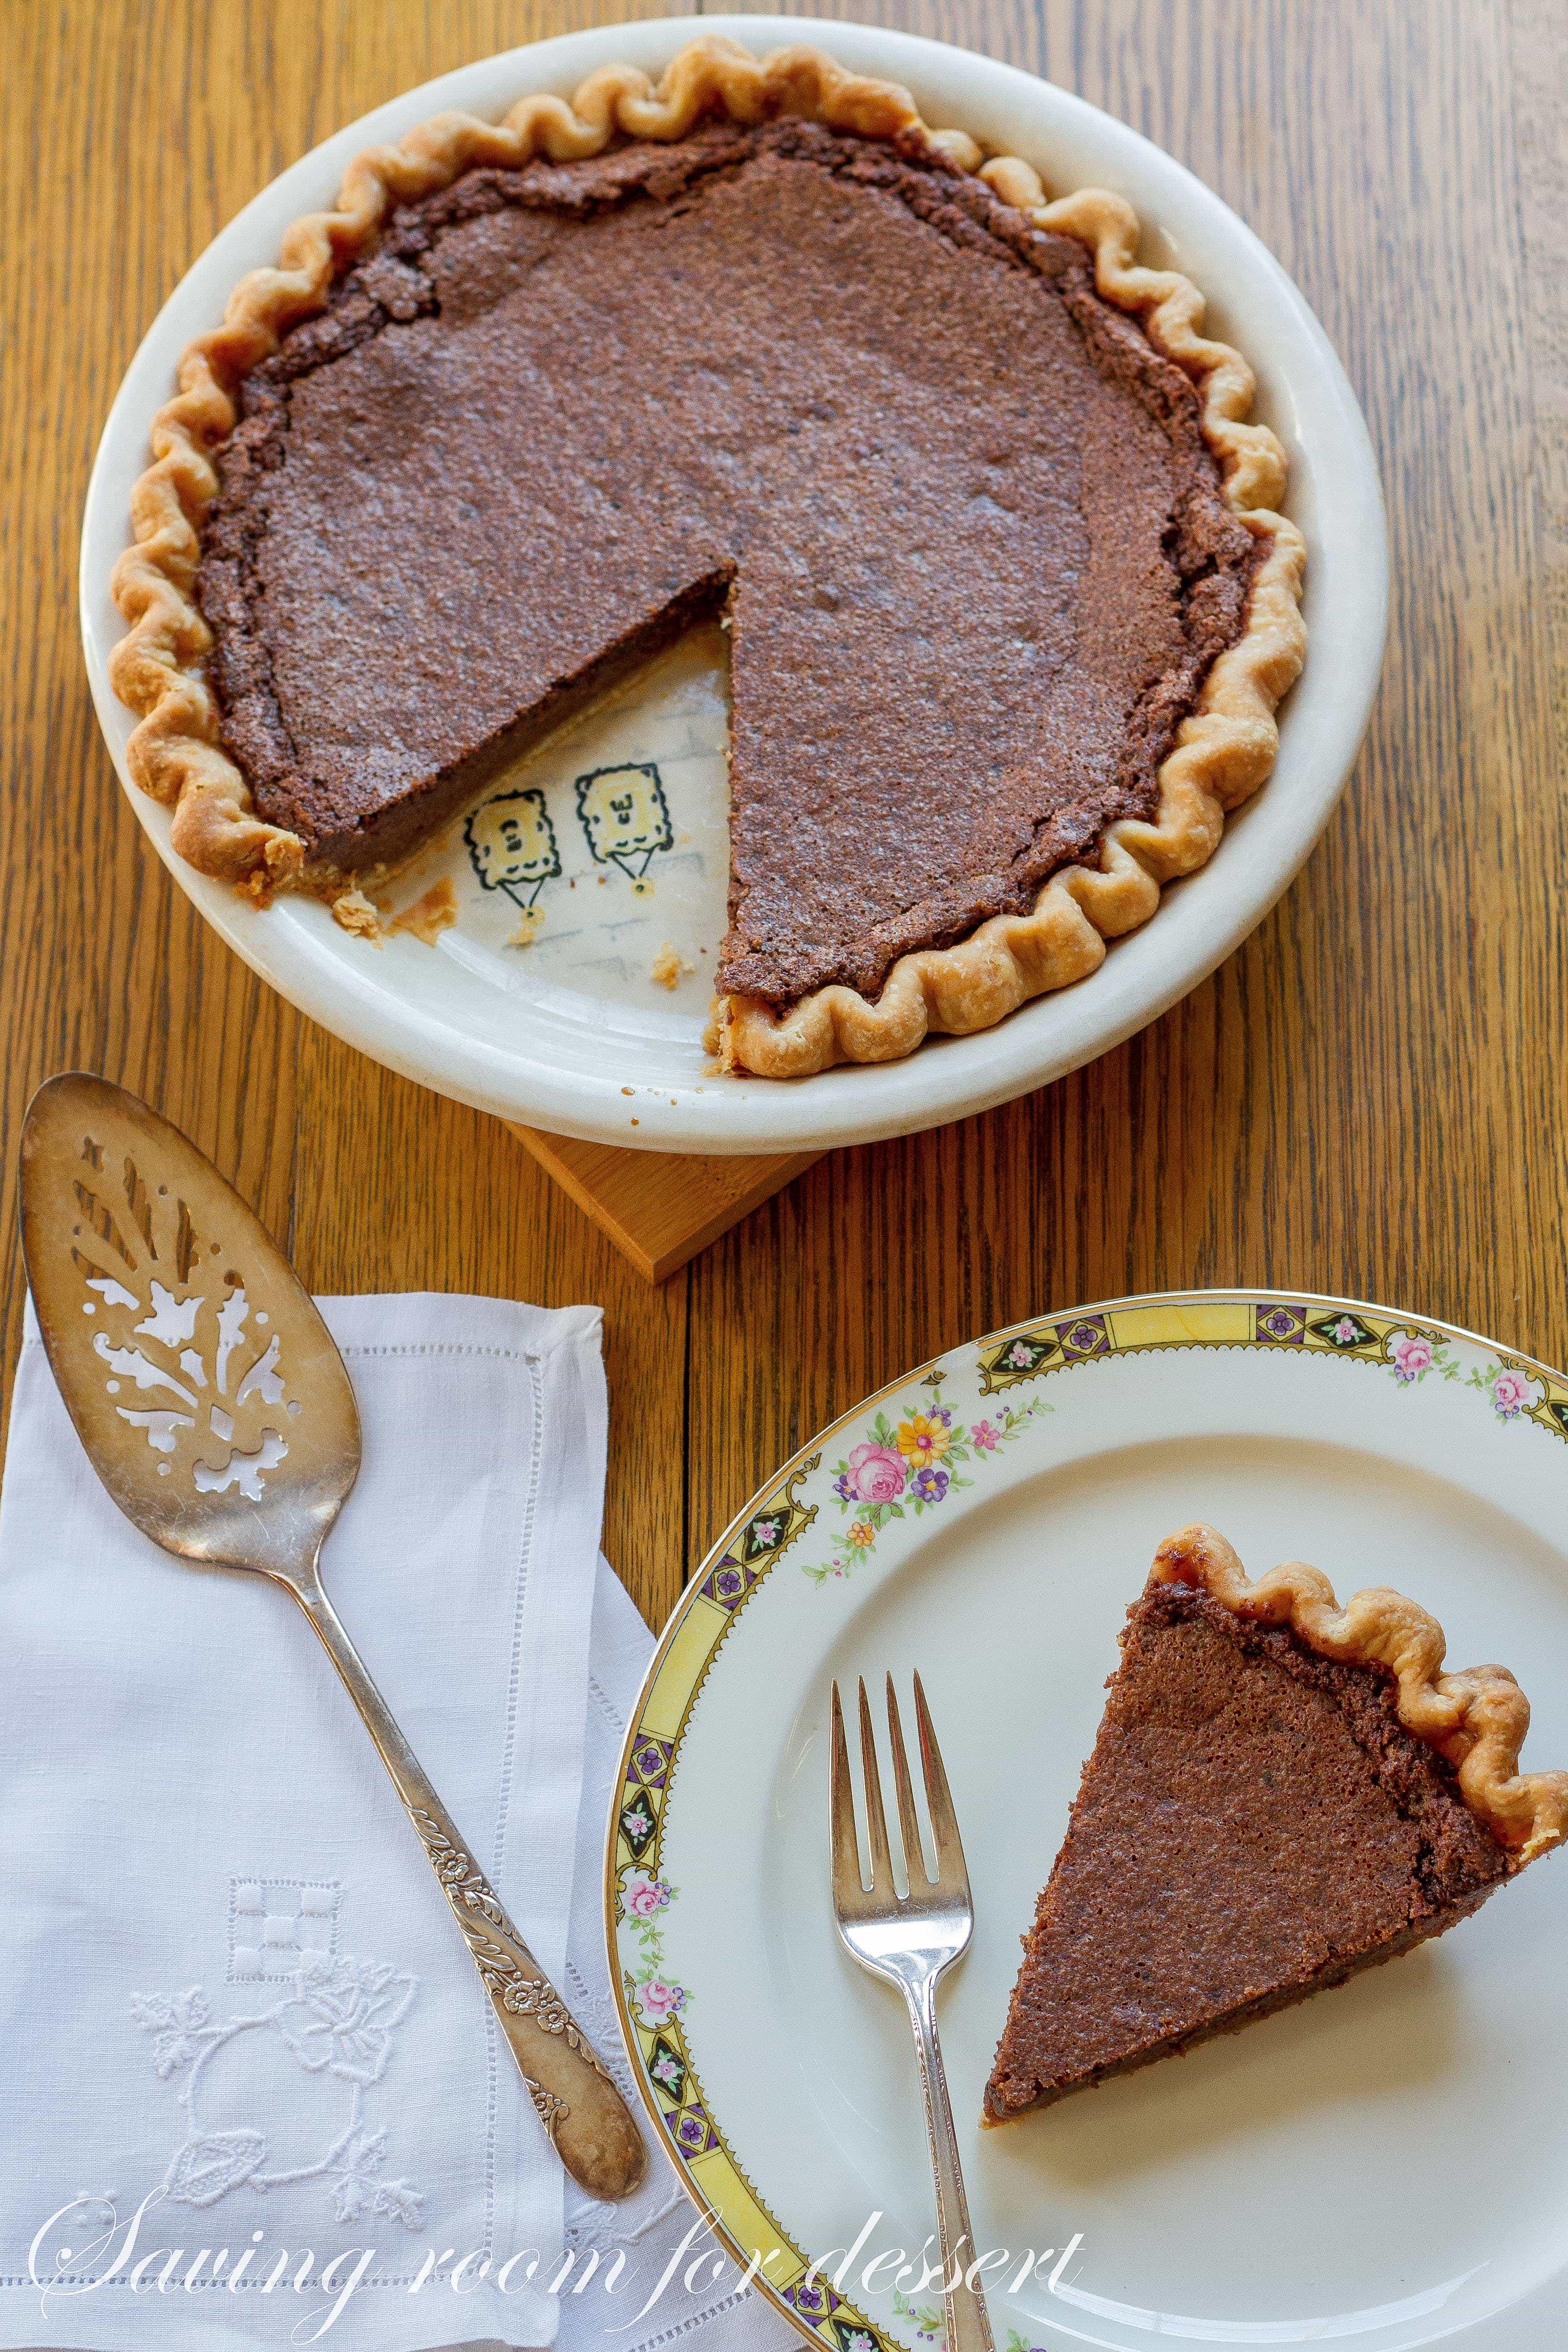 Minny's Chocolate Pie - Saving Room for Dessert